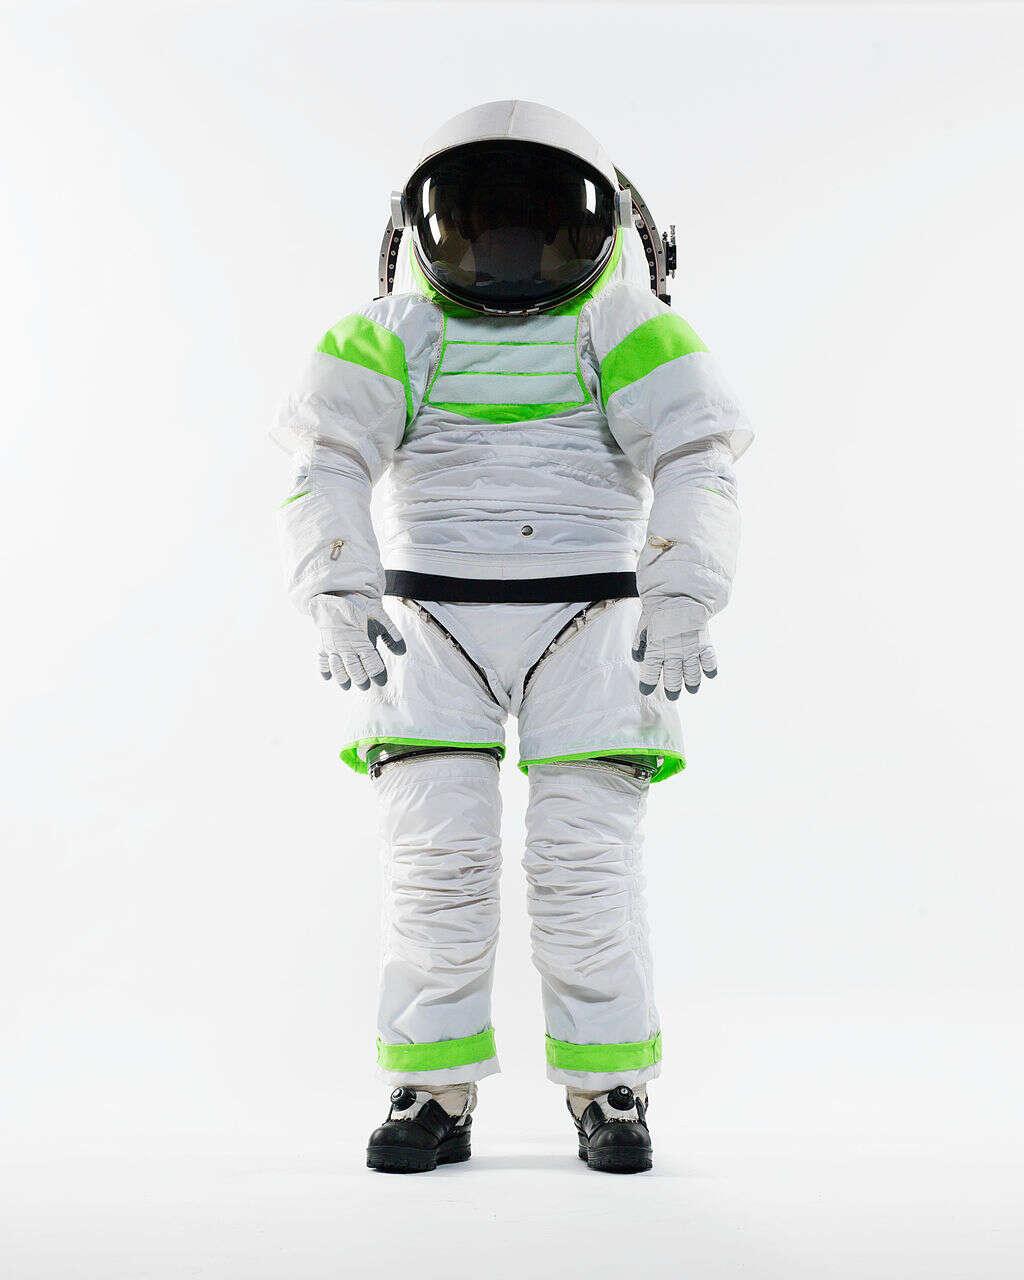 Z-1_Spacesuit_Prototype_-_standing_Nov_2012